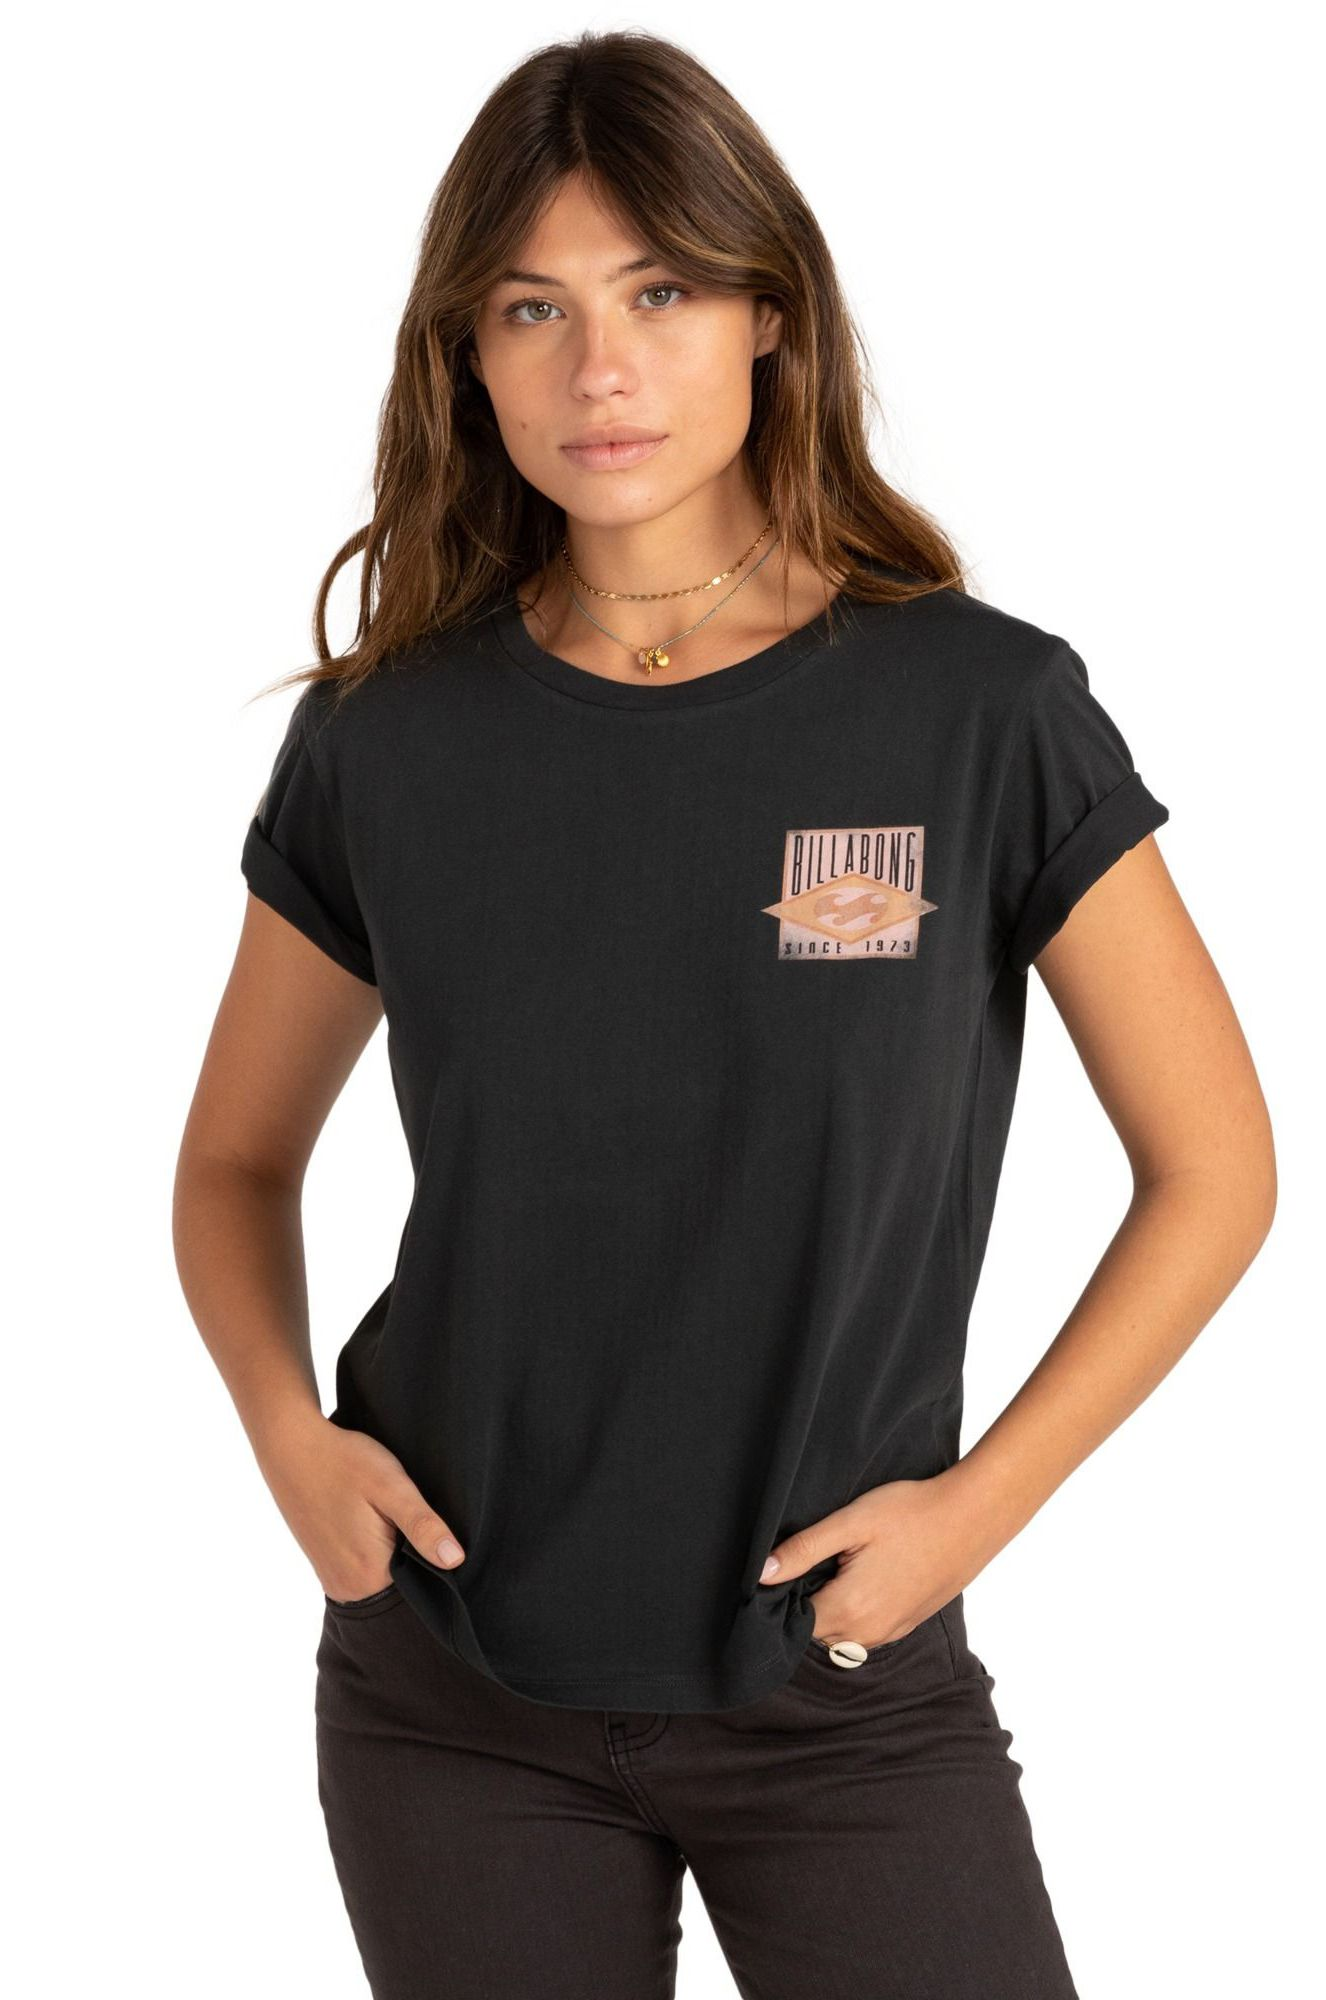 Billabong T-Shirt DIAMOND LEGACY Off Black